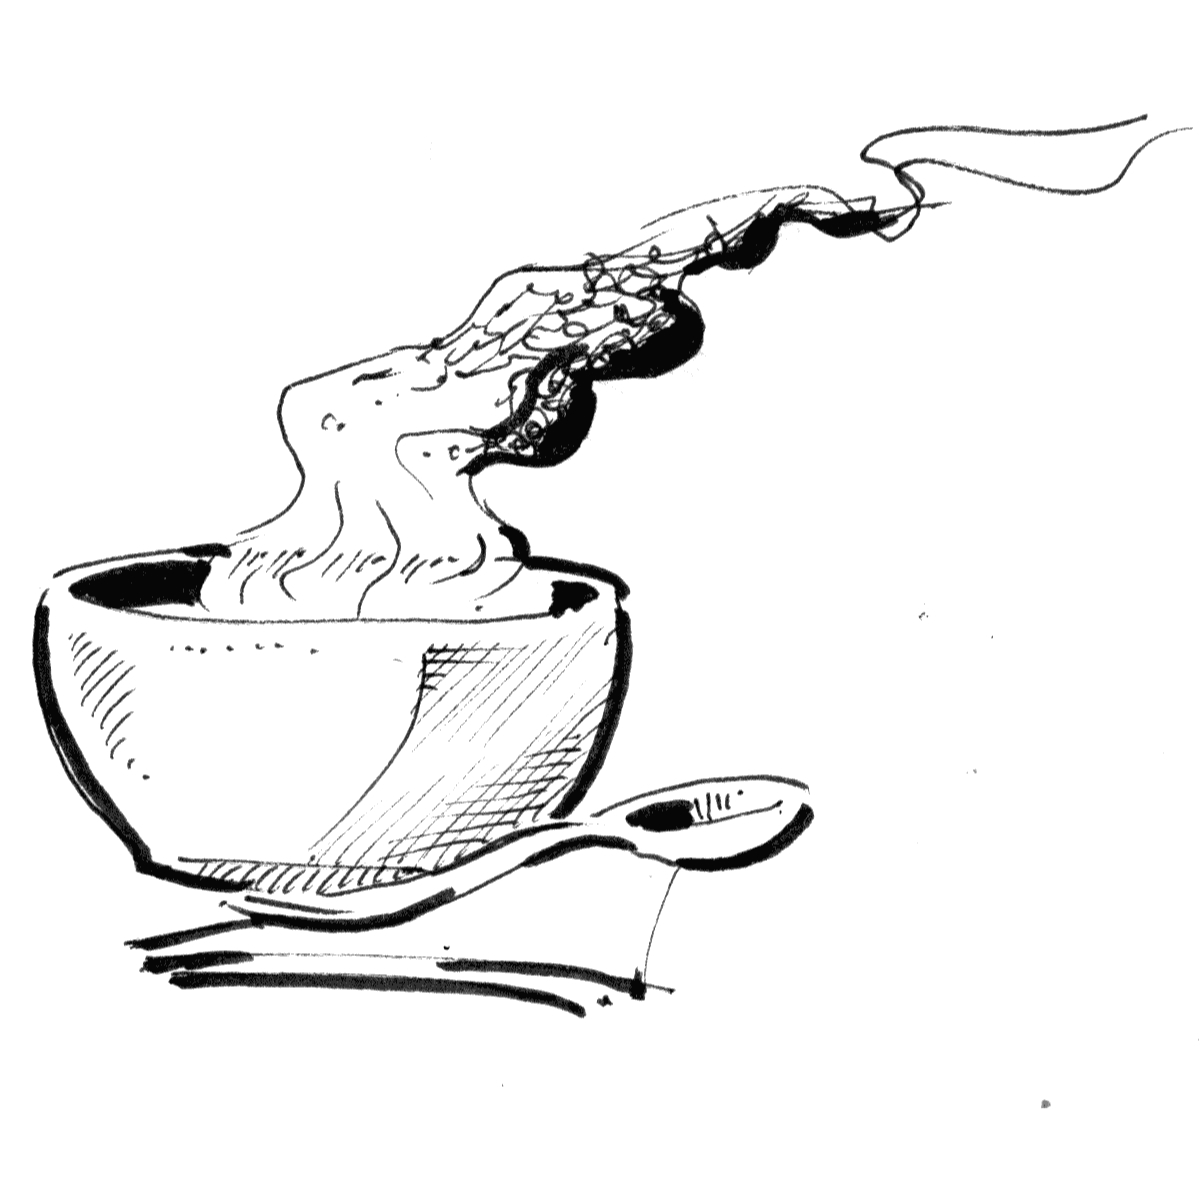 04-vignette-food-menu-hardcore-soup.jpg